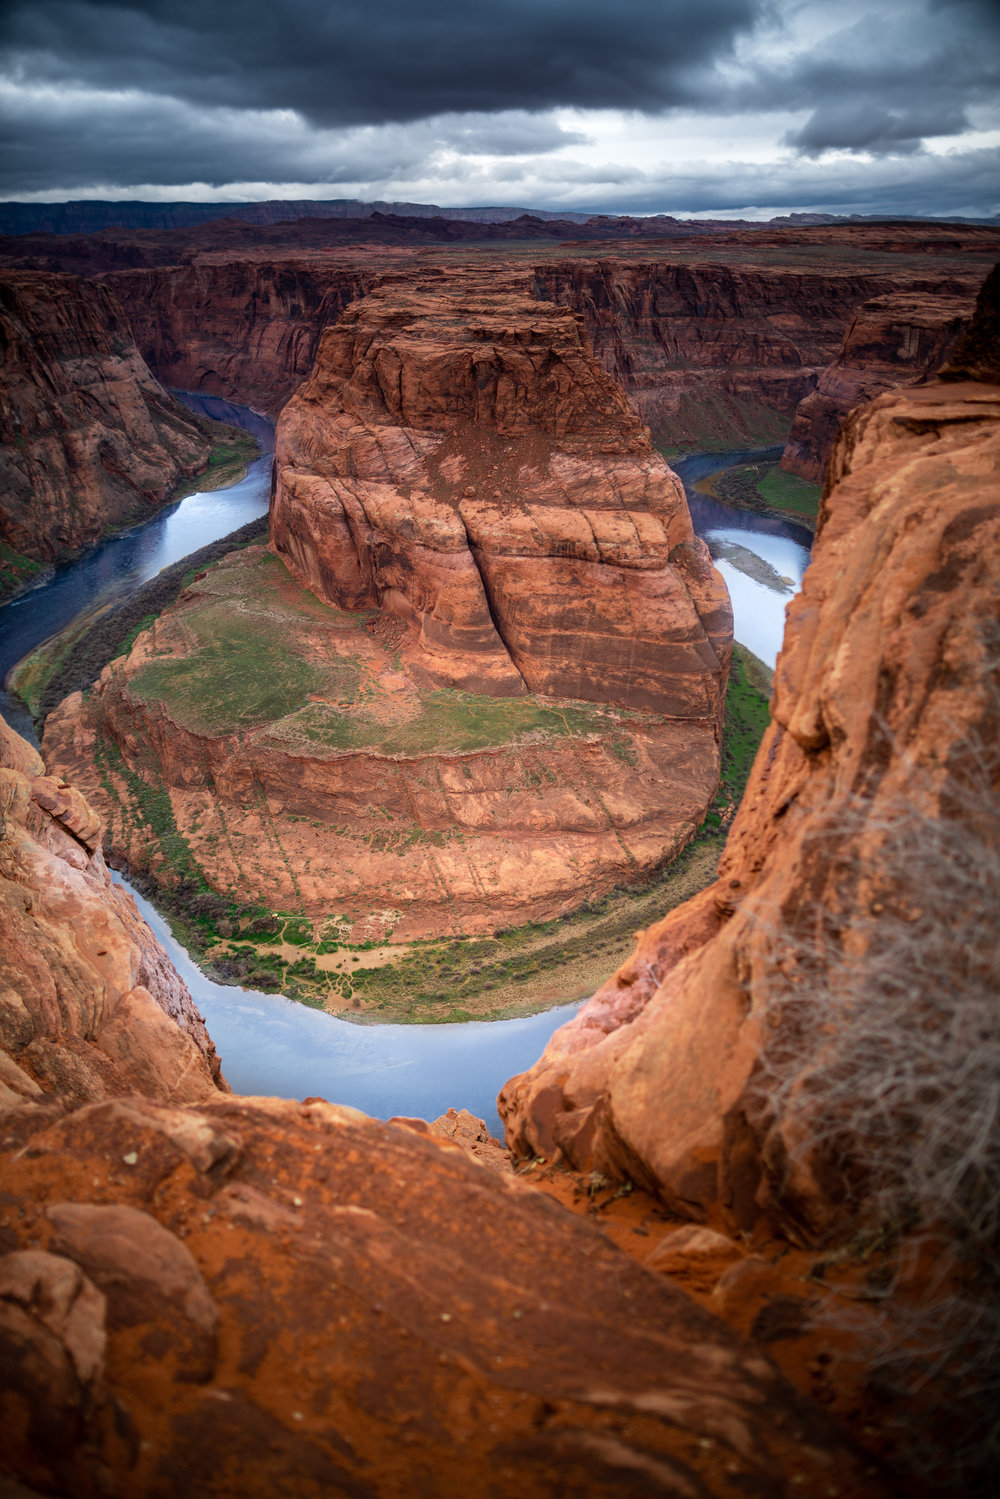 Horseshoe Bend outside of Page, Arizona